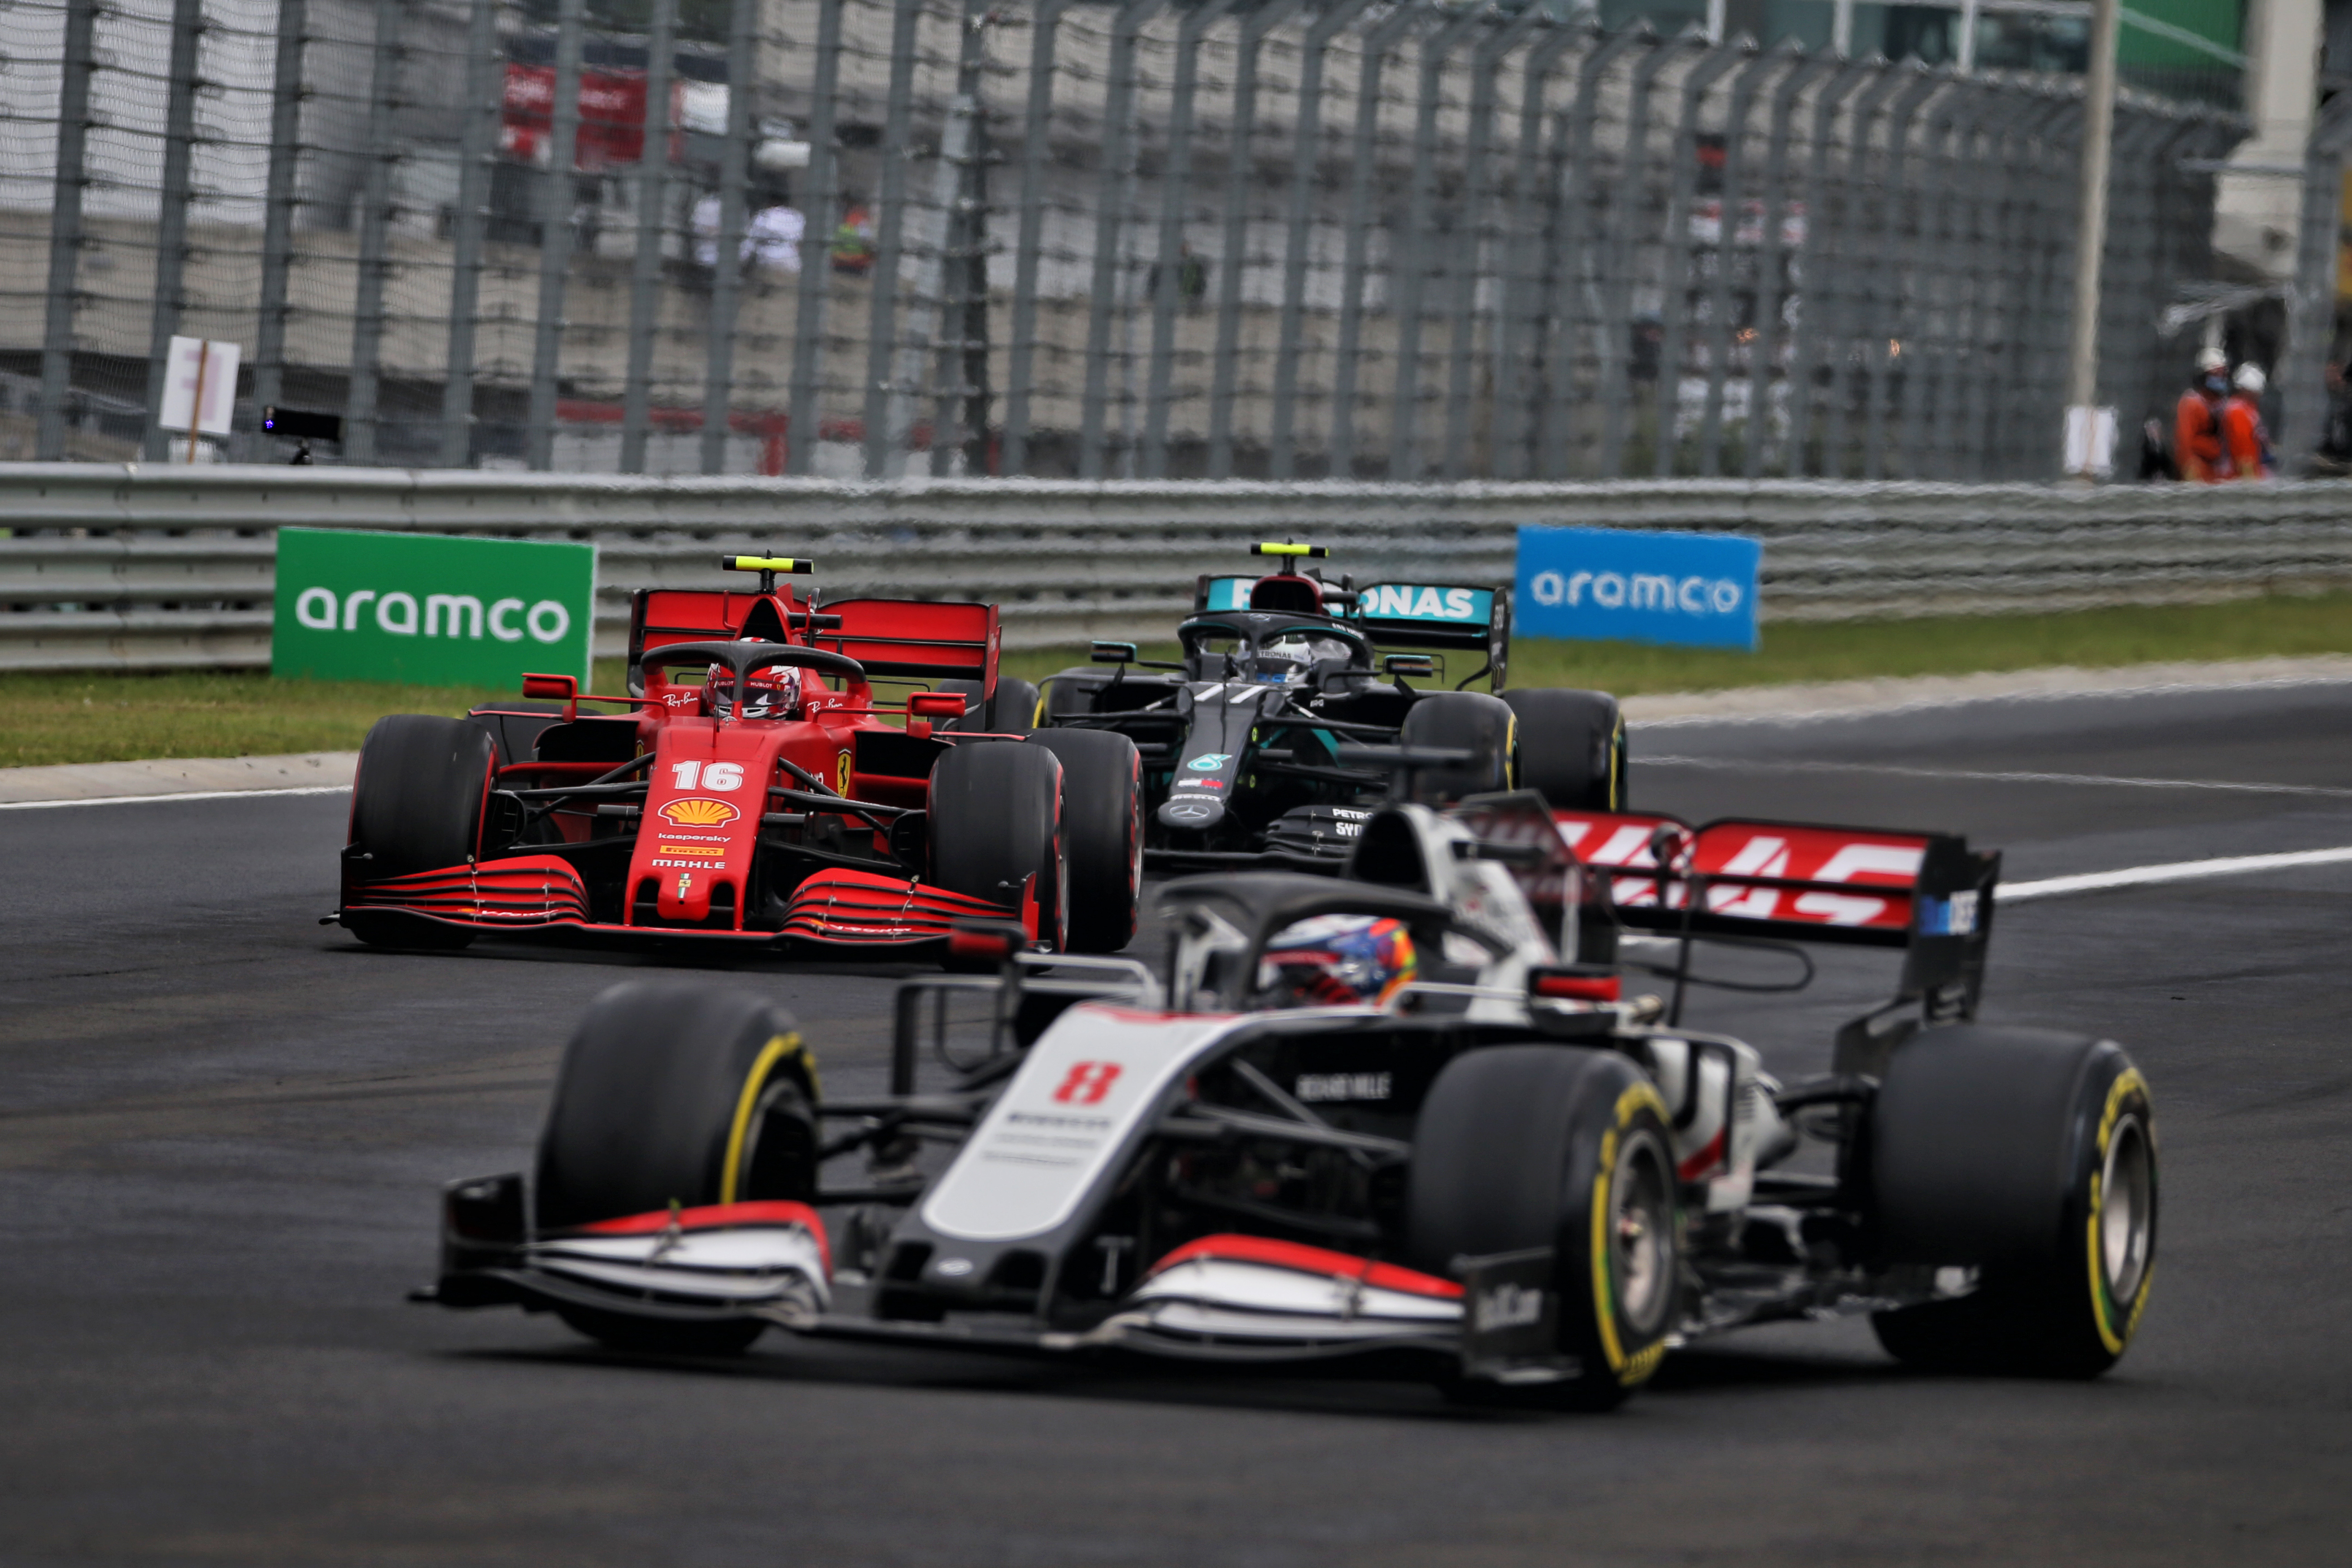 Romain Grosjean Haas Hungarian Grand Prix 2020